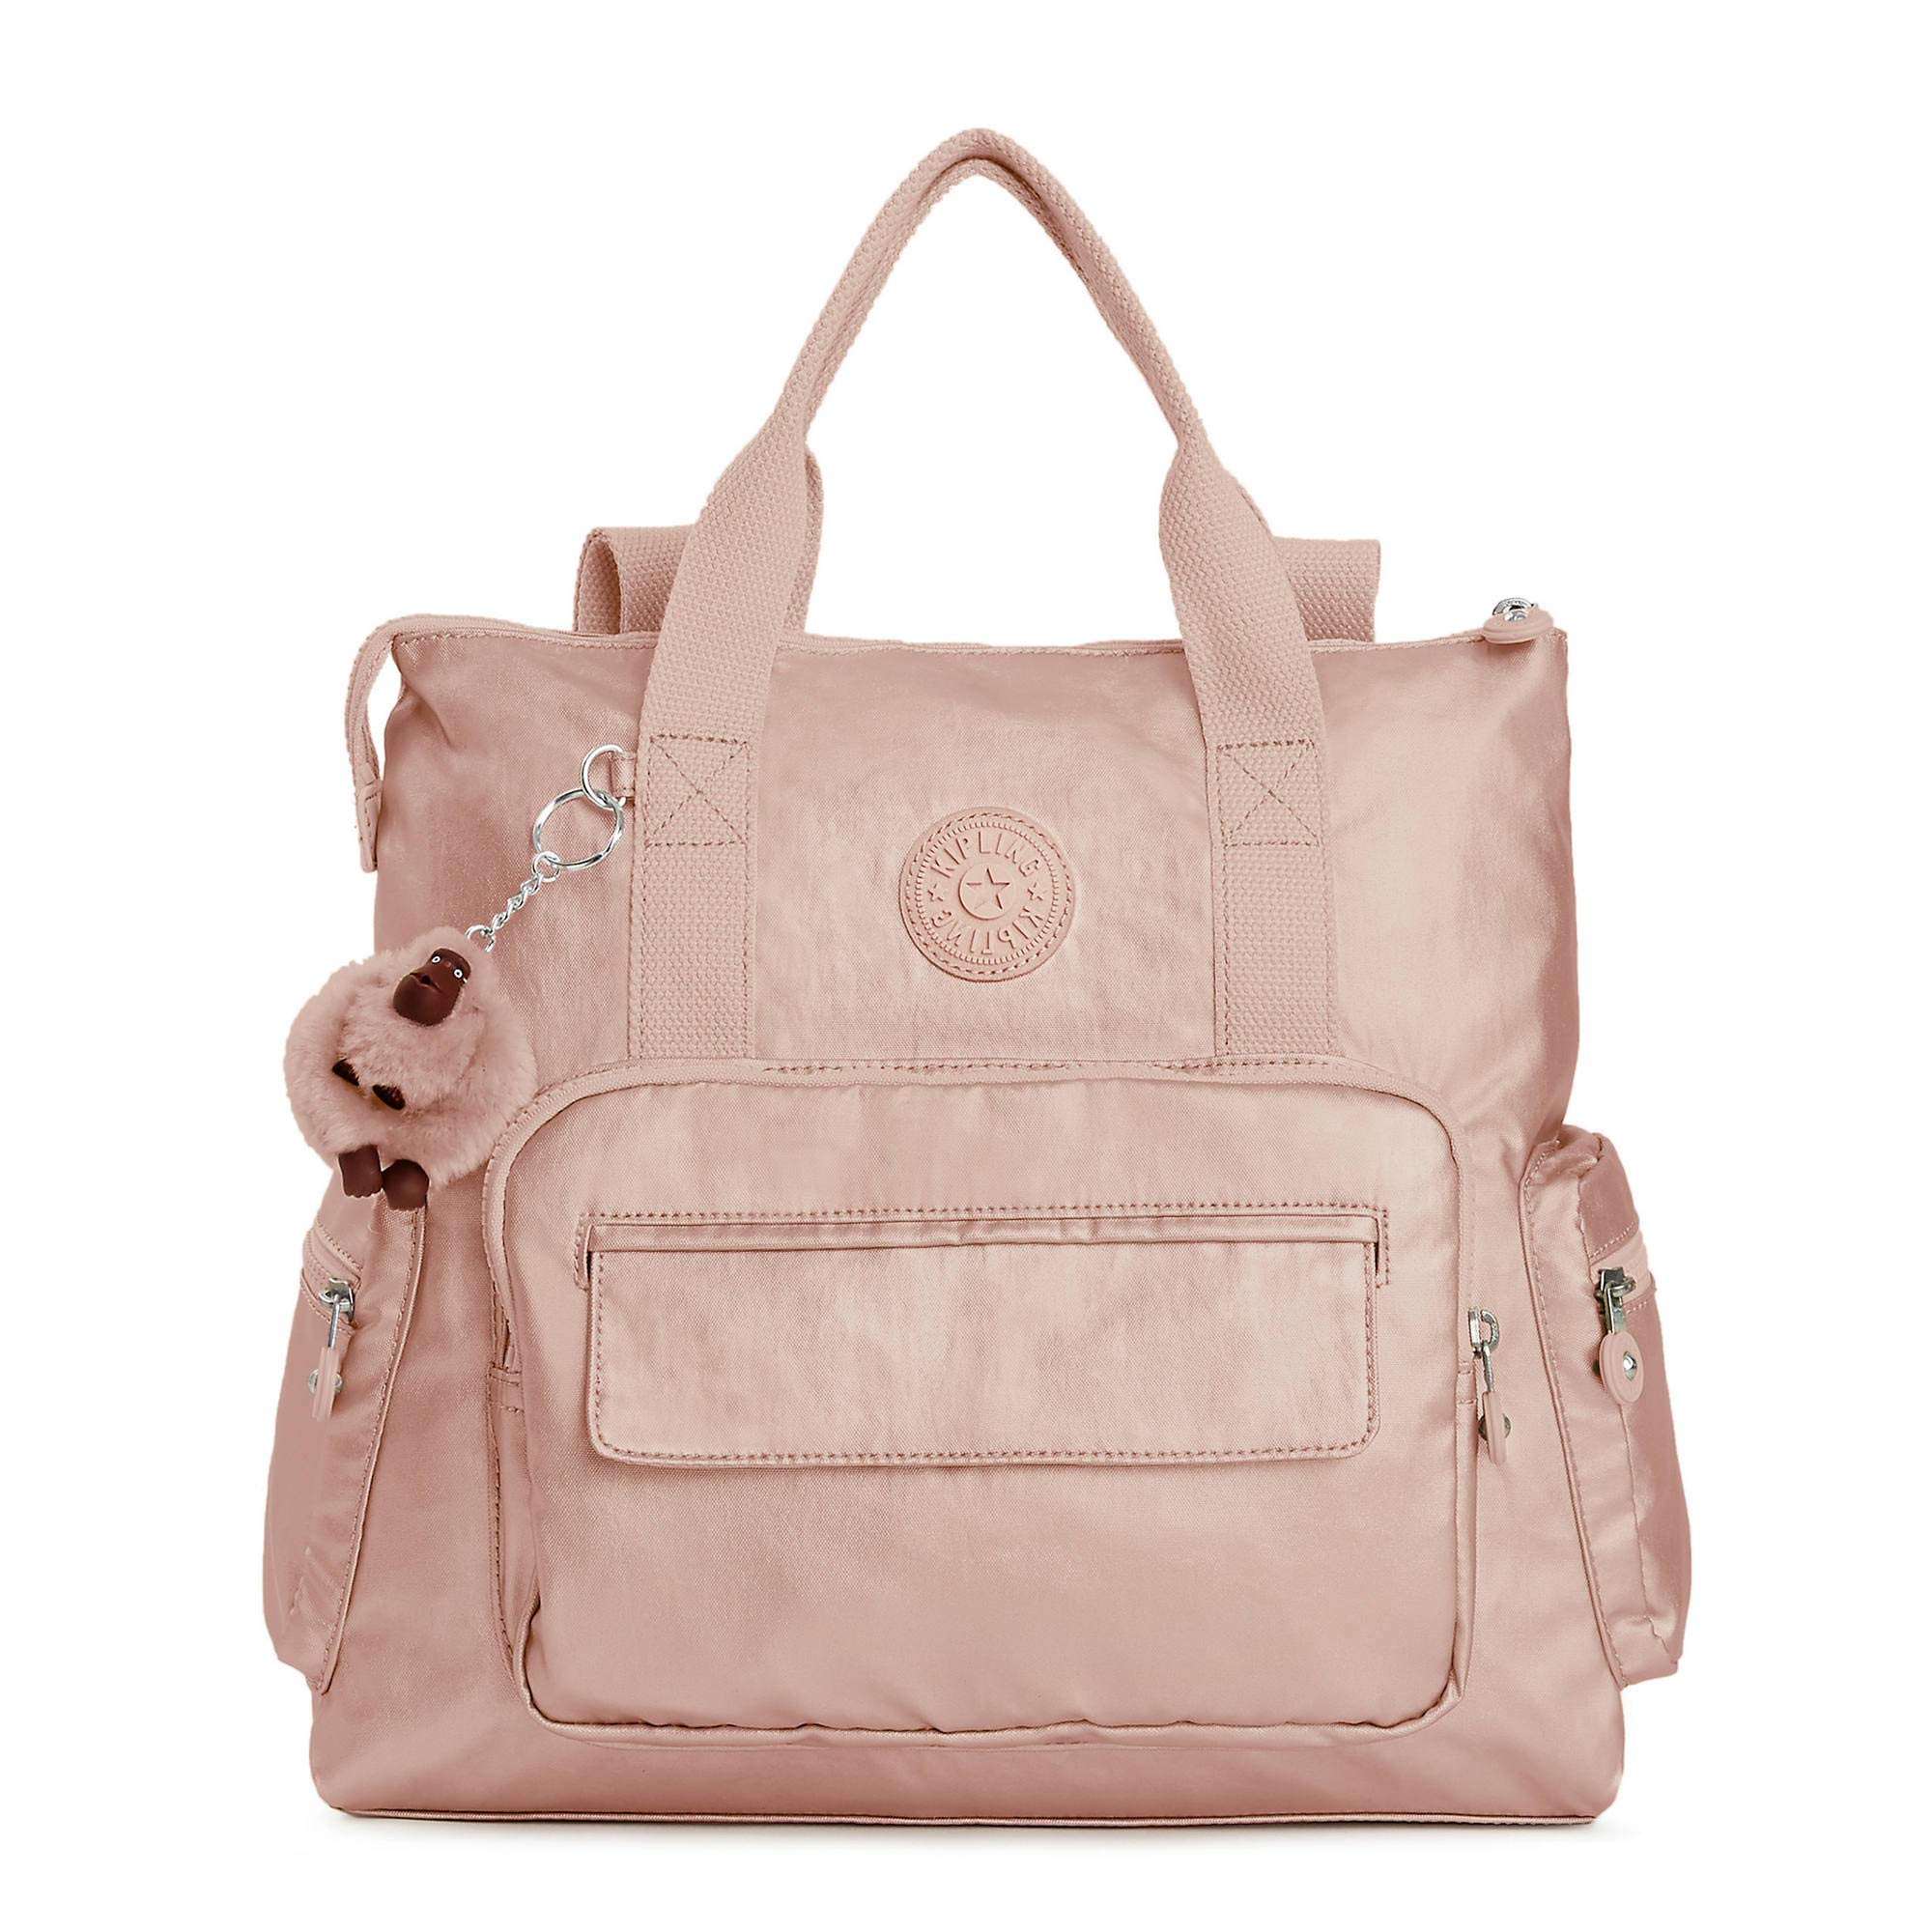 Kipling Alvy 2-In-1 Convertible Metallic Tote Bag Backpack One Size Rose Gold Metallic